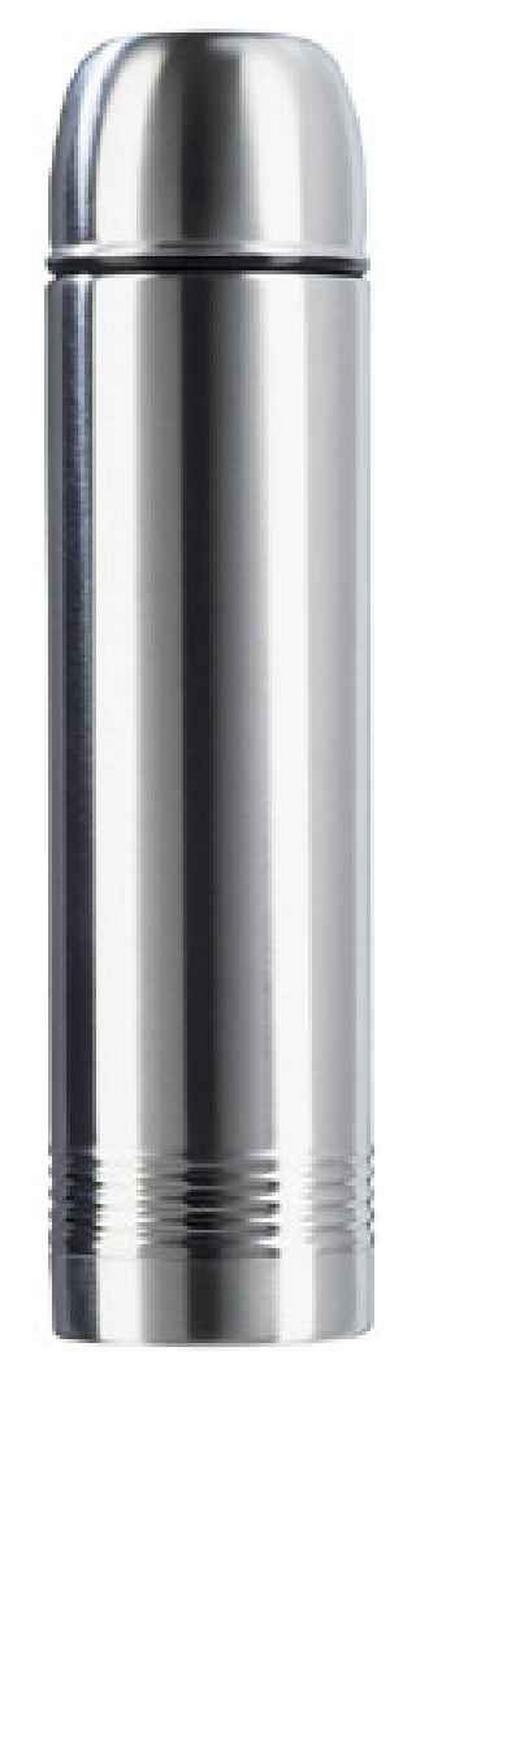 ISOLIERFLASCHE 0,7 L - Edelstahlfarben, Basics, Metall (7,5/7,5/30cm) - Emsa